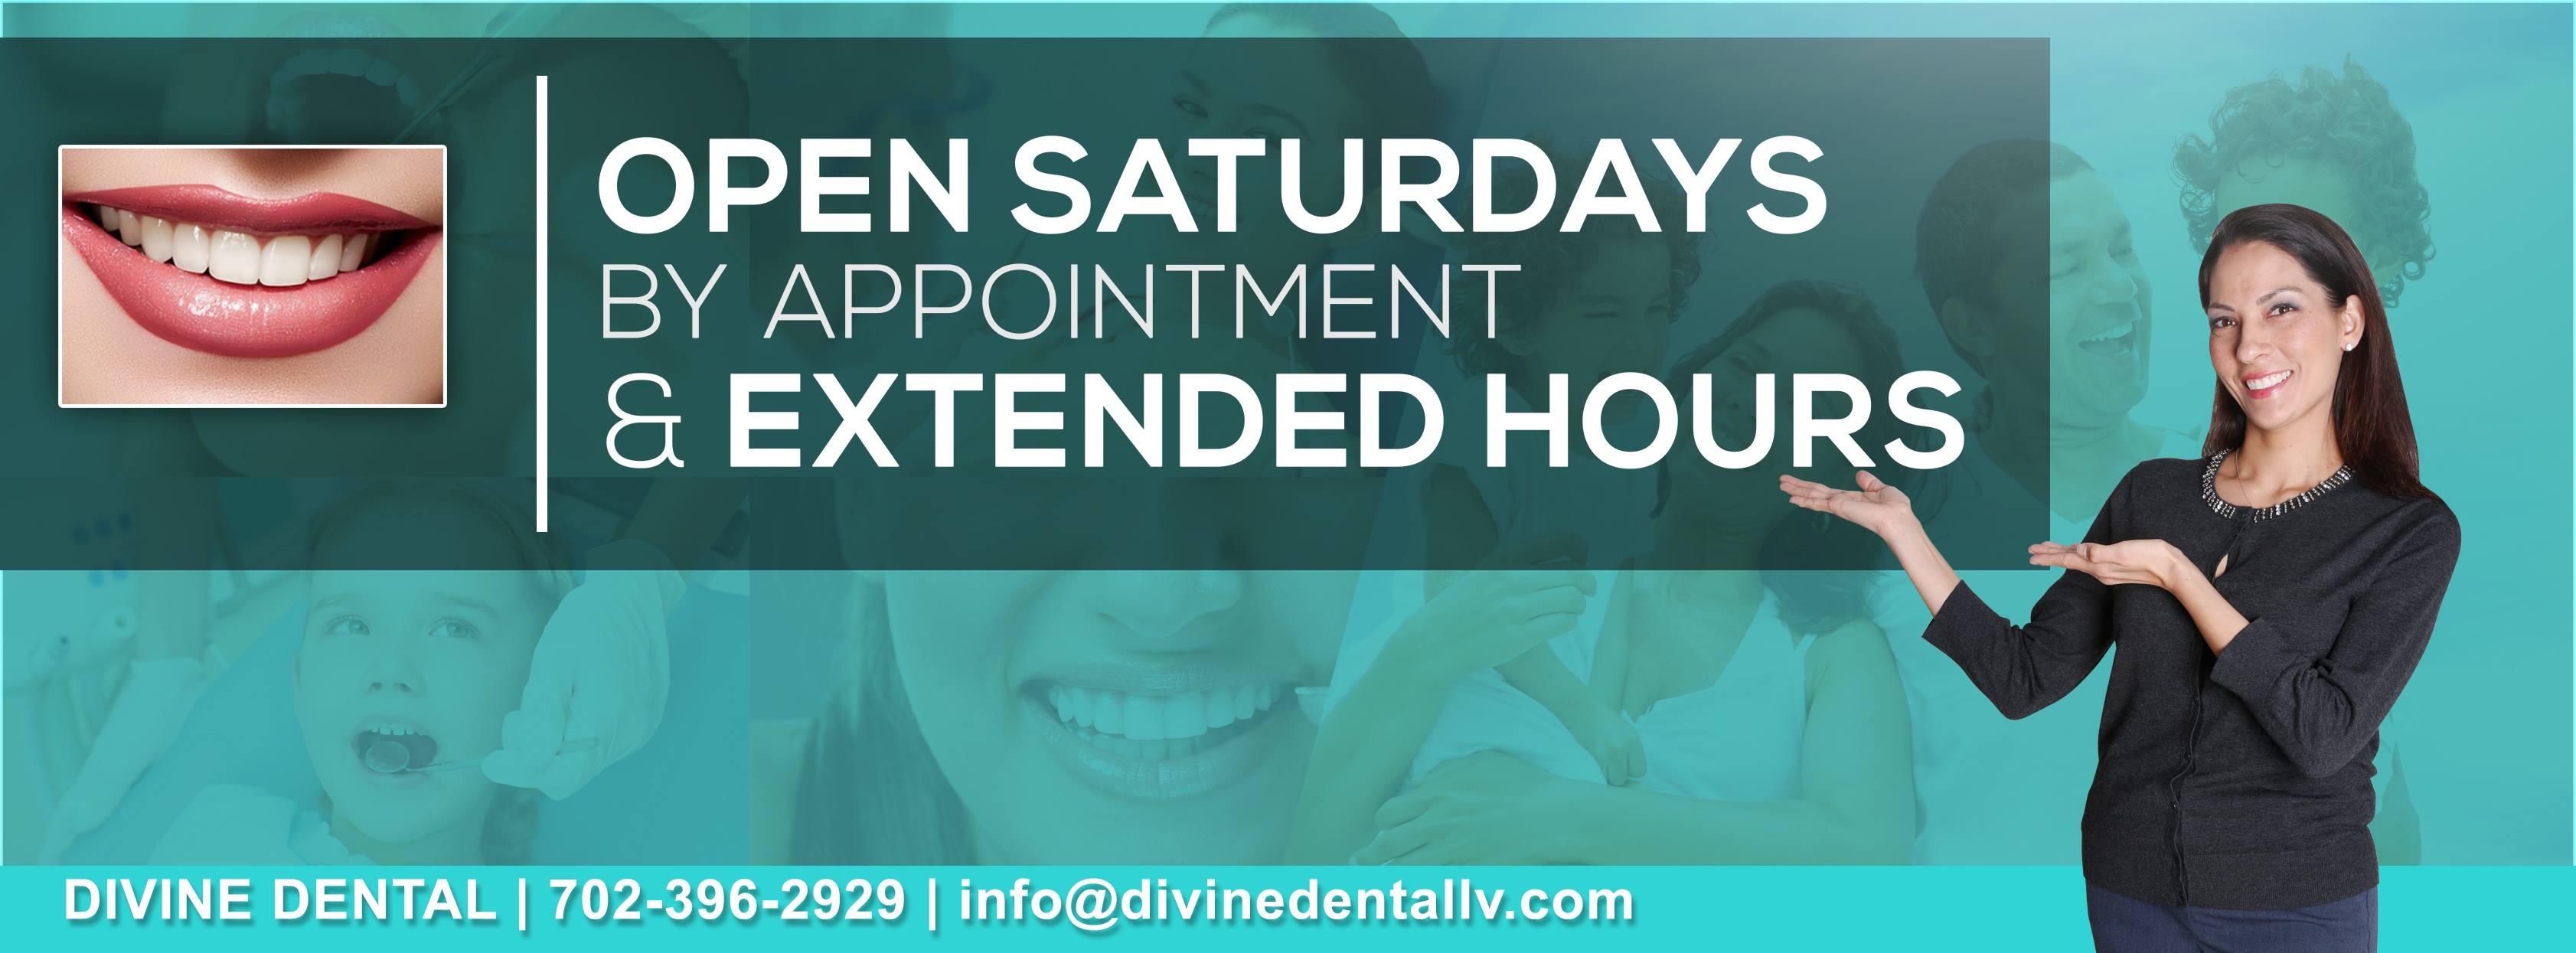 Divine Dental Open Saturdays